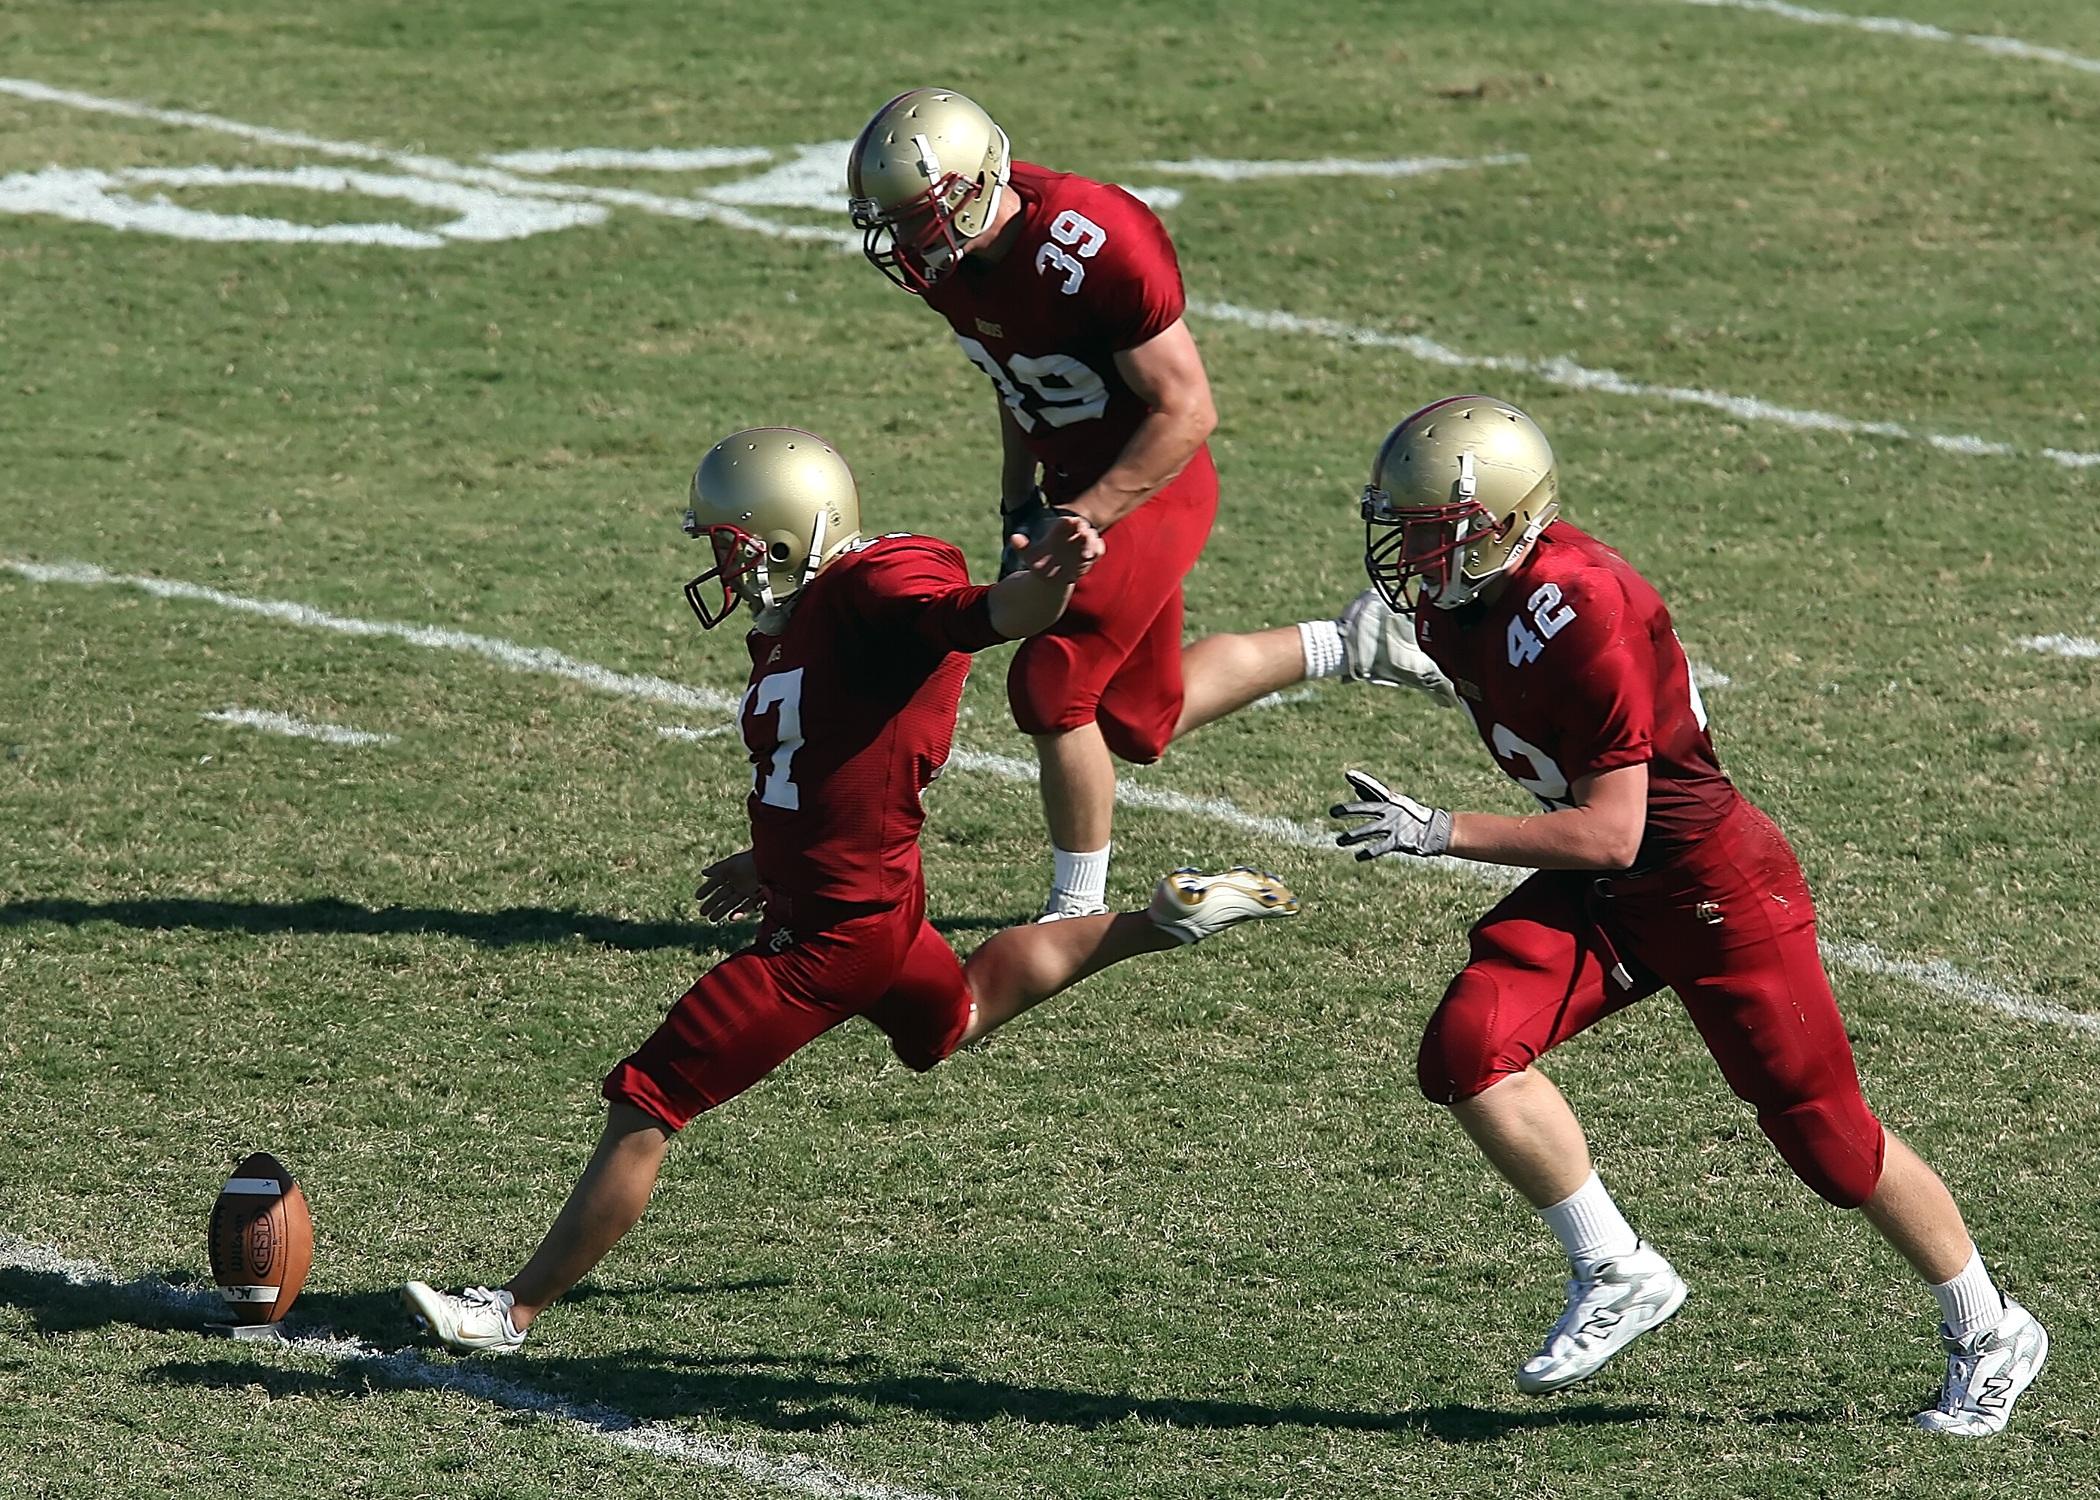 Trio play in field